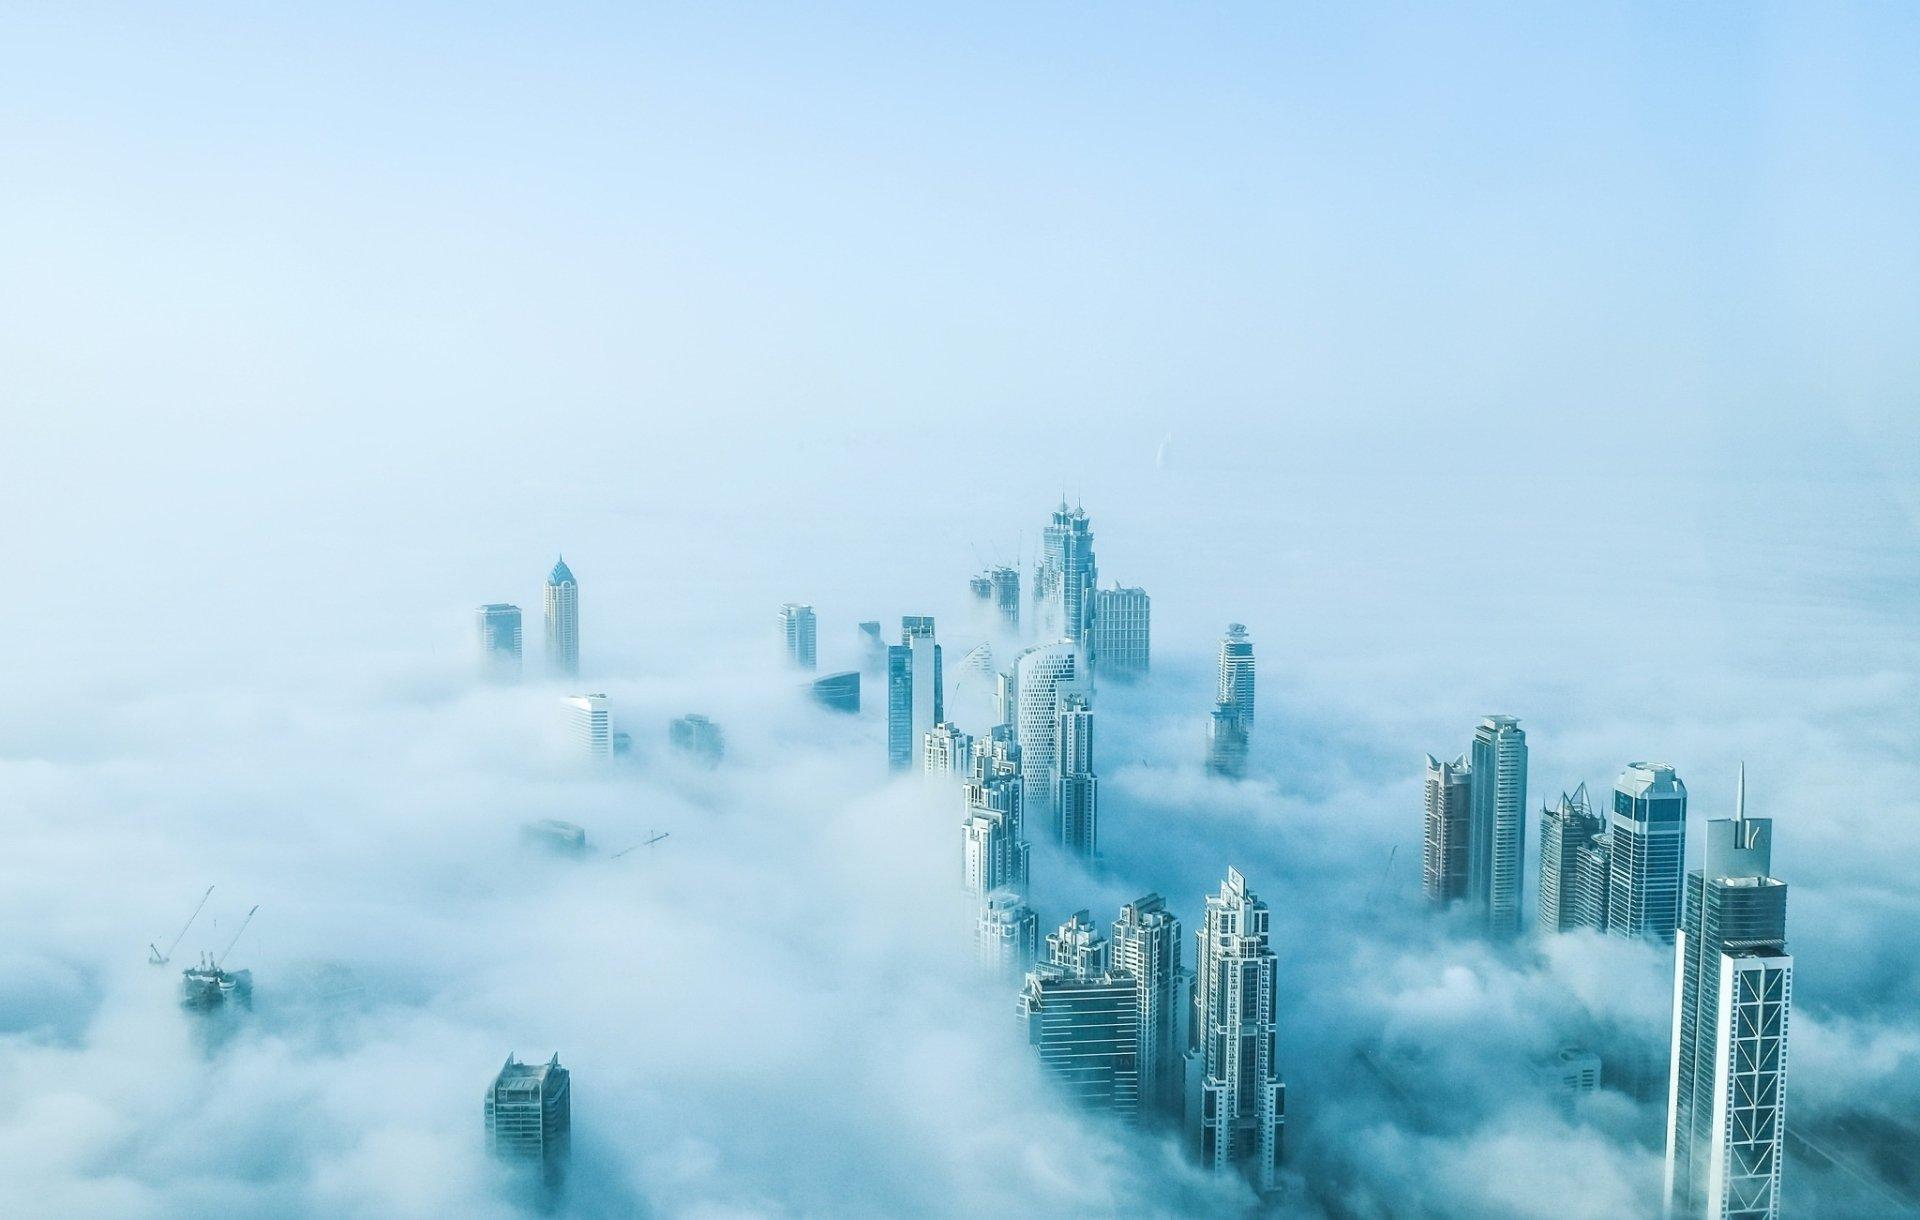 Man Made - Dubai  Aerial Building Skyscraper United Arab Emirates Fog City Wallpaper